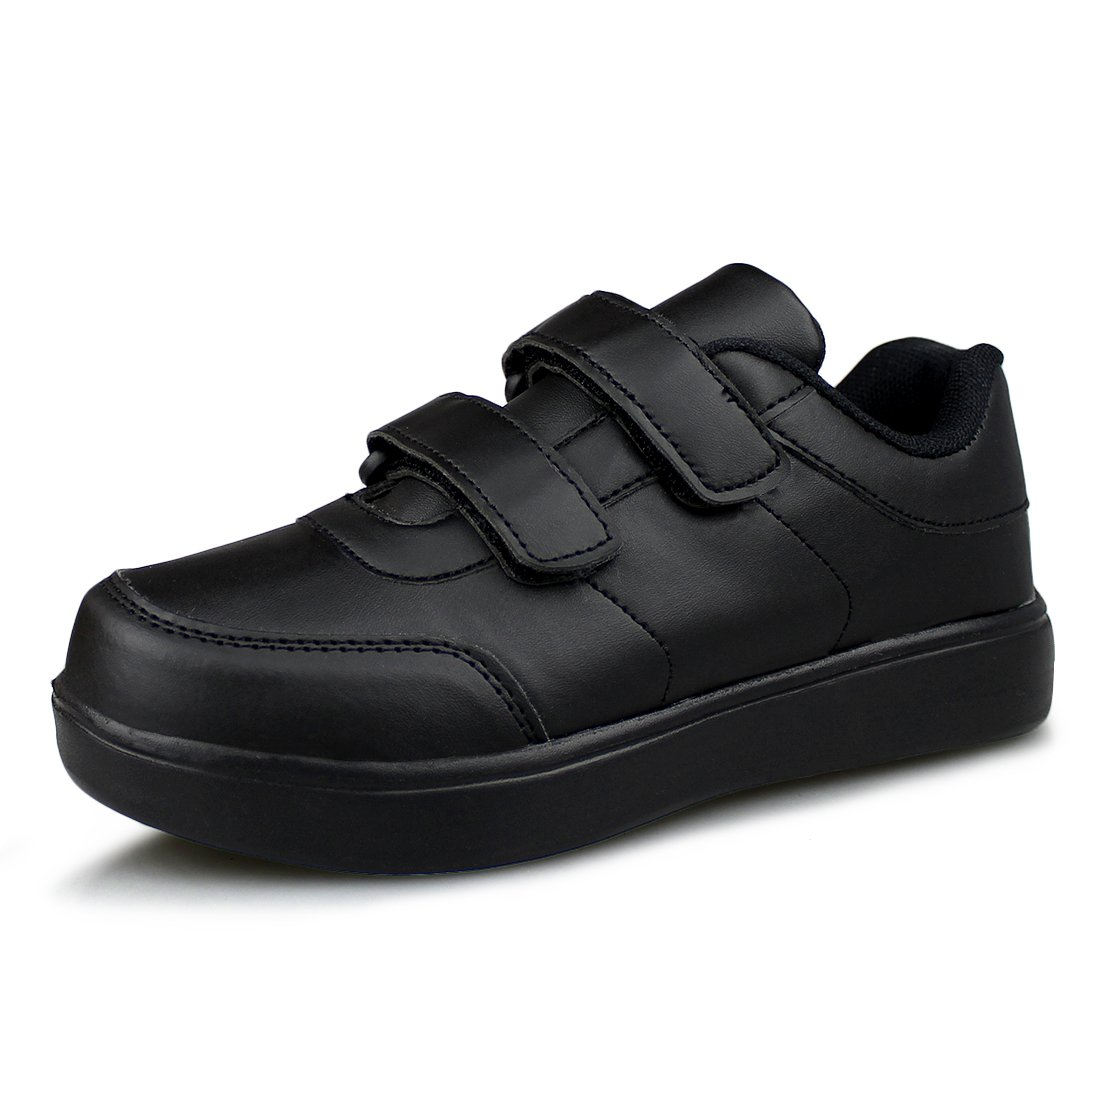 Hawkwell Kids School Uniform Sport Shoes(Toddler/Little Kid),Black PU,11 M US